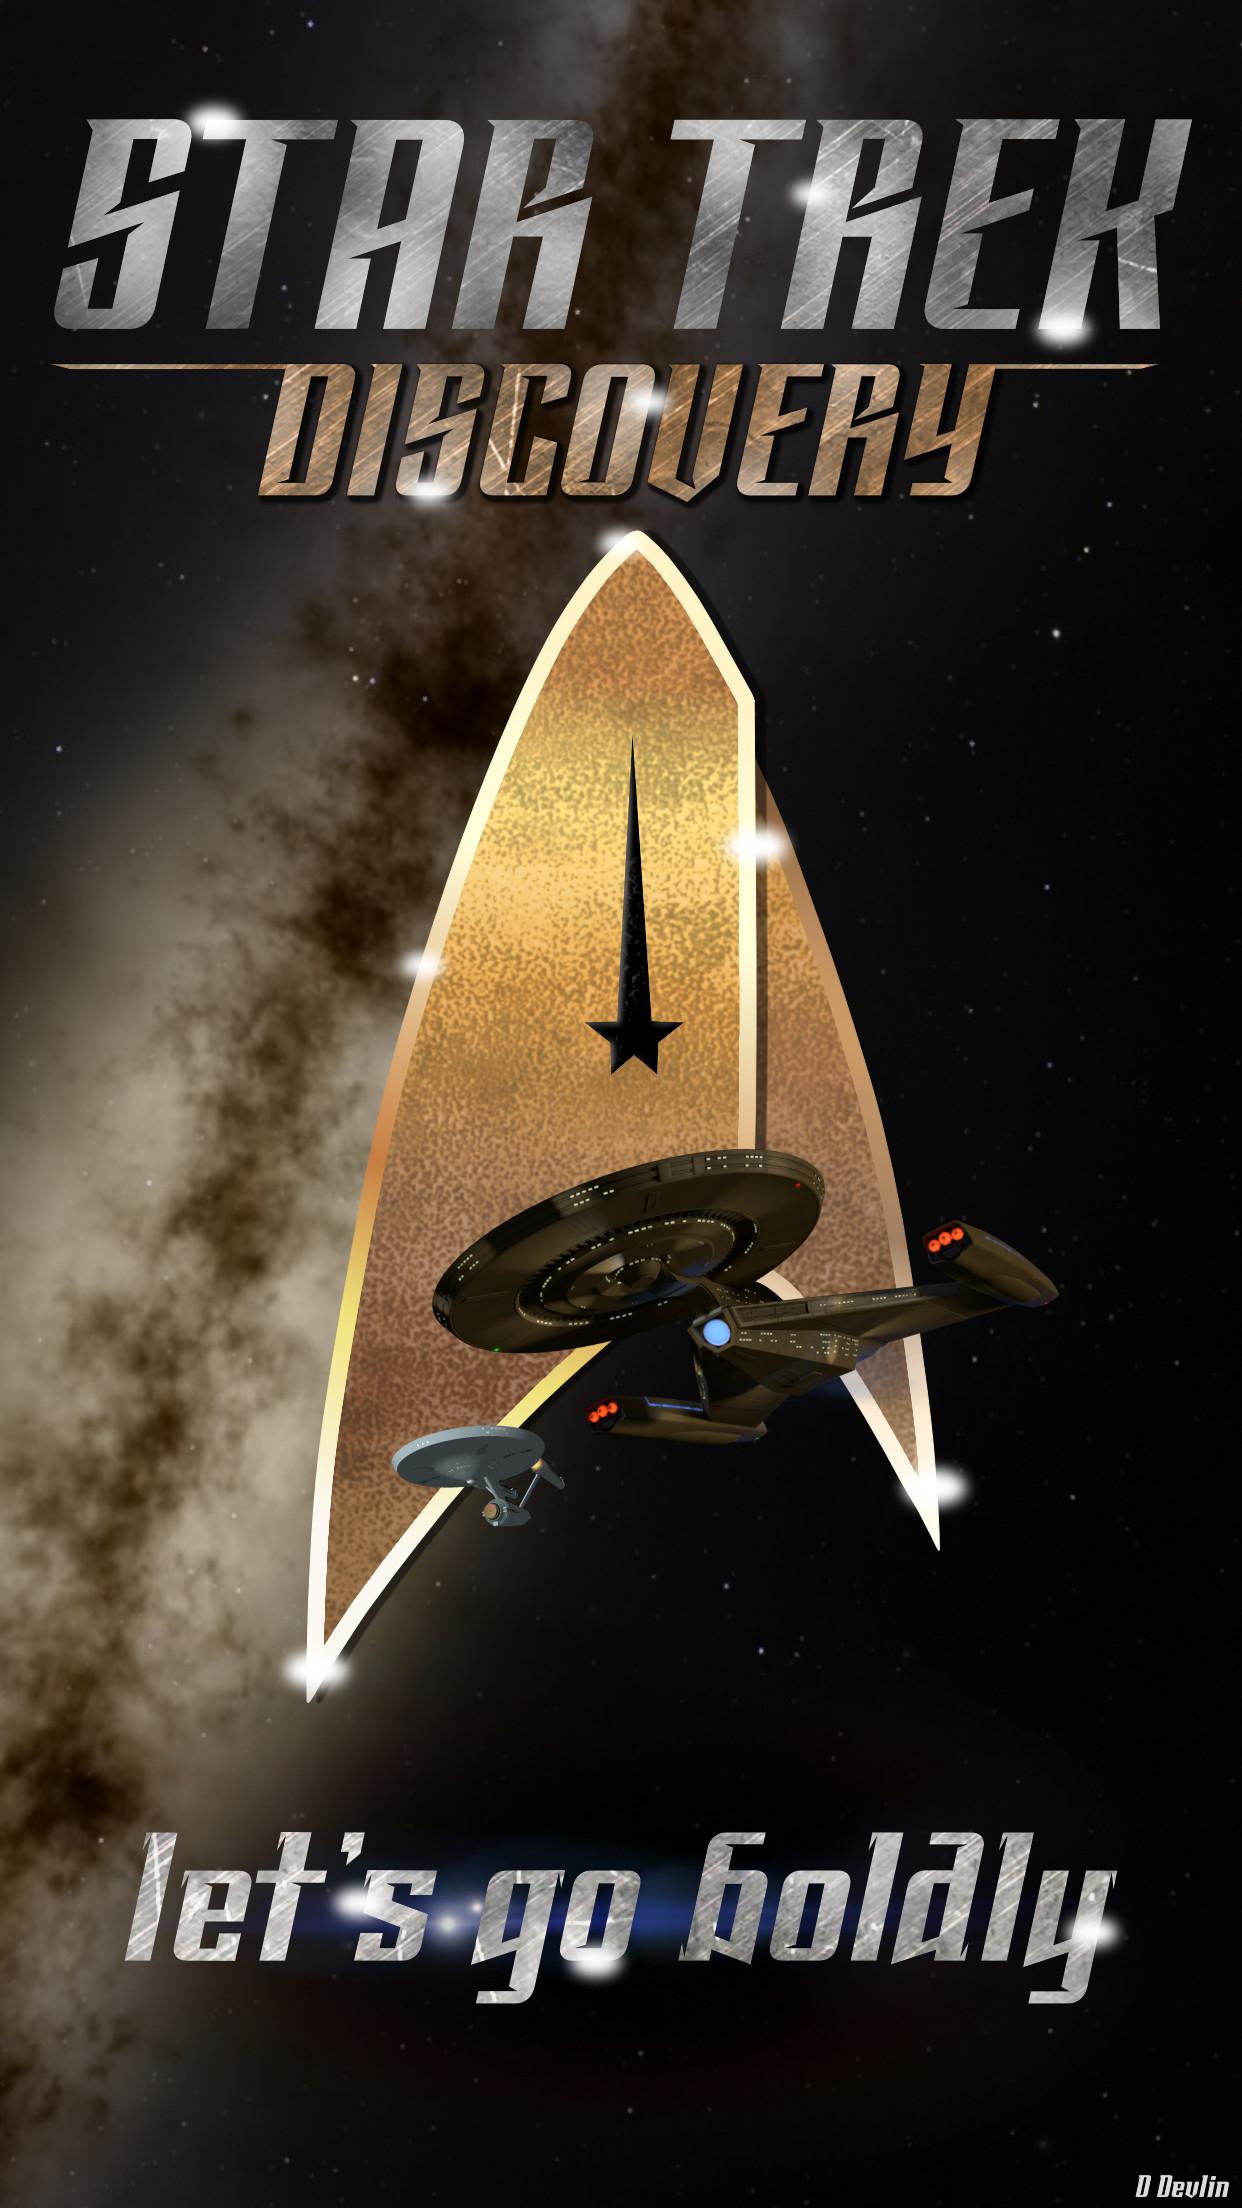 Star Trek Discovery Phone Wallpaper